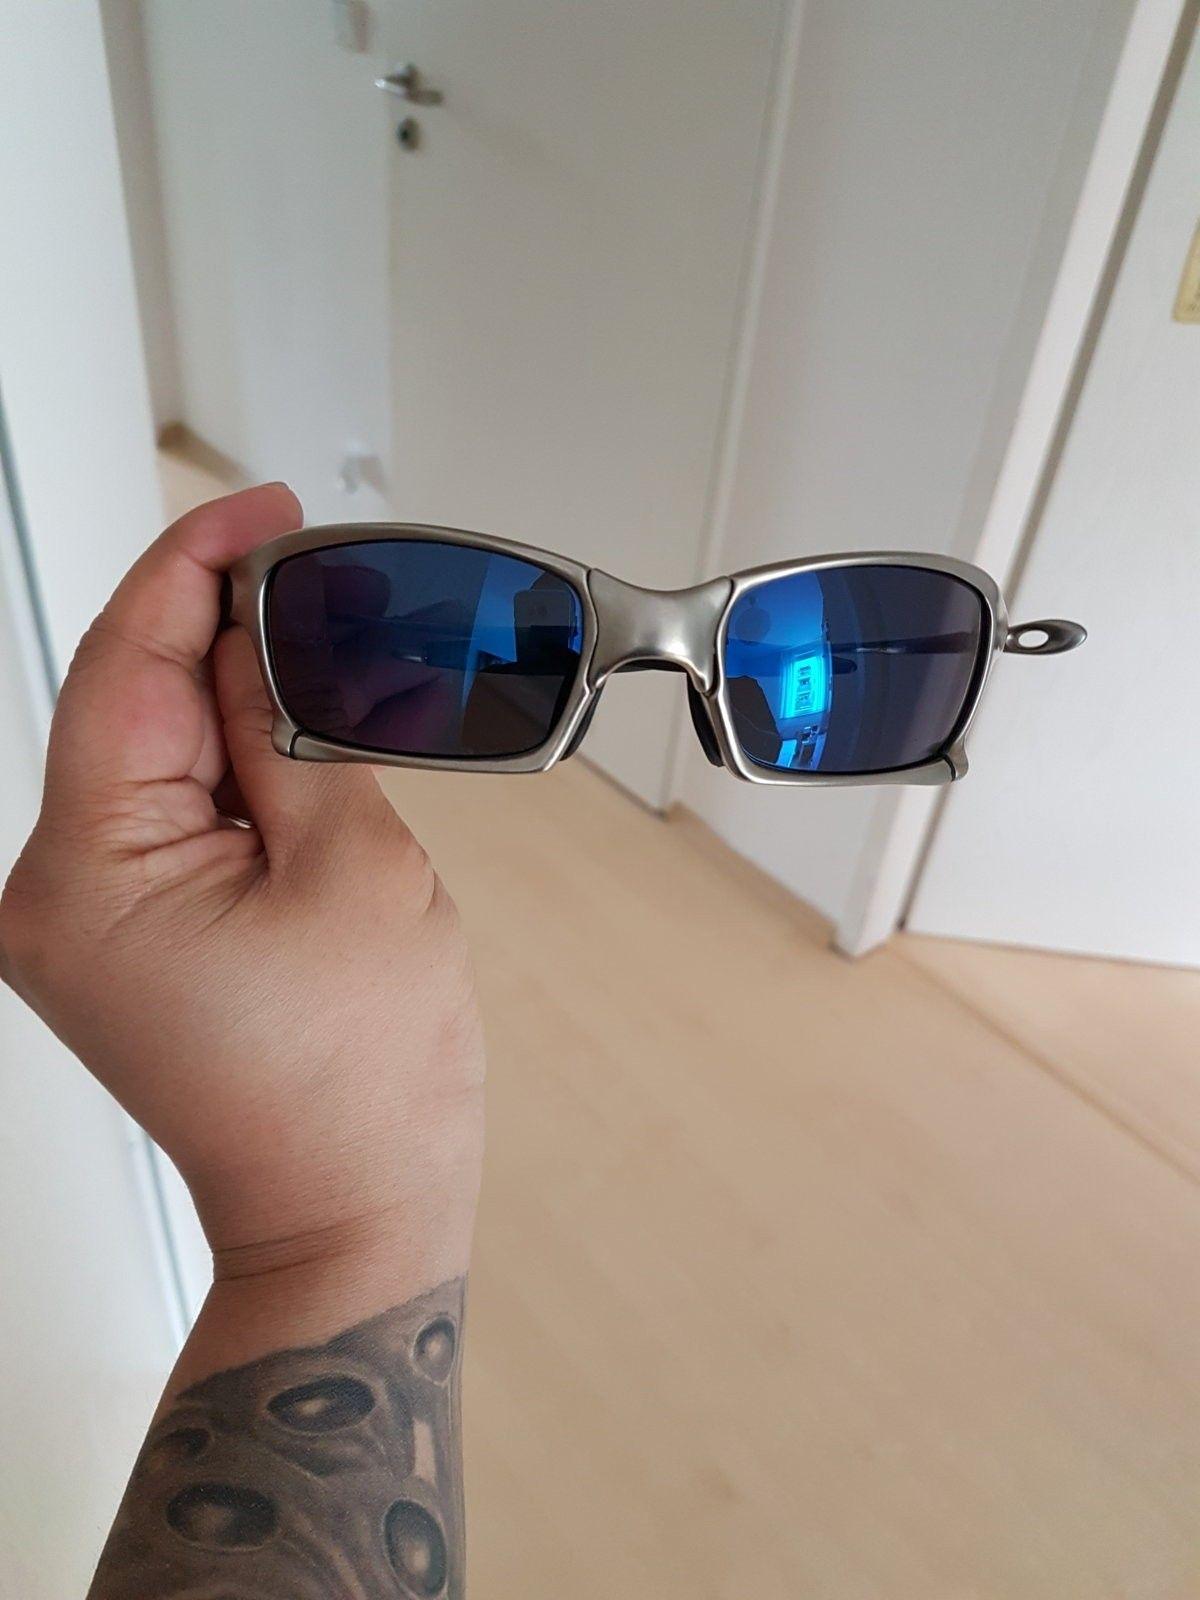 Plasma XS blue mint condition 560 $ shipped - 20160515_182355.jpg